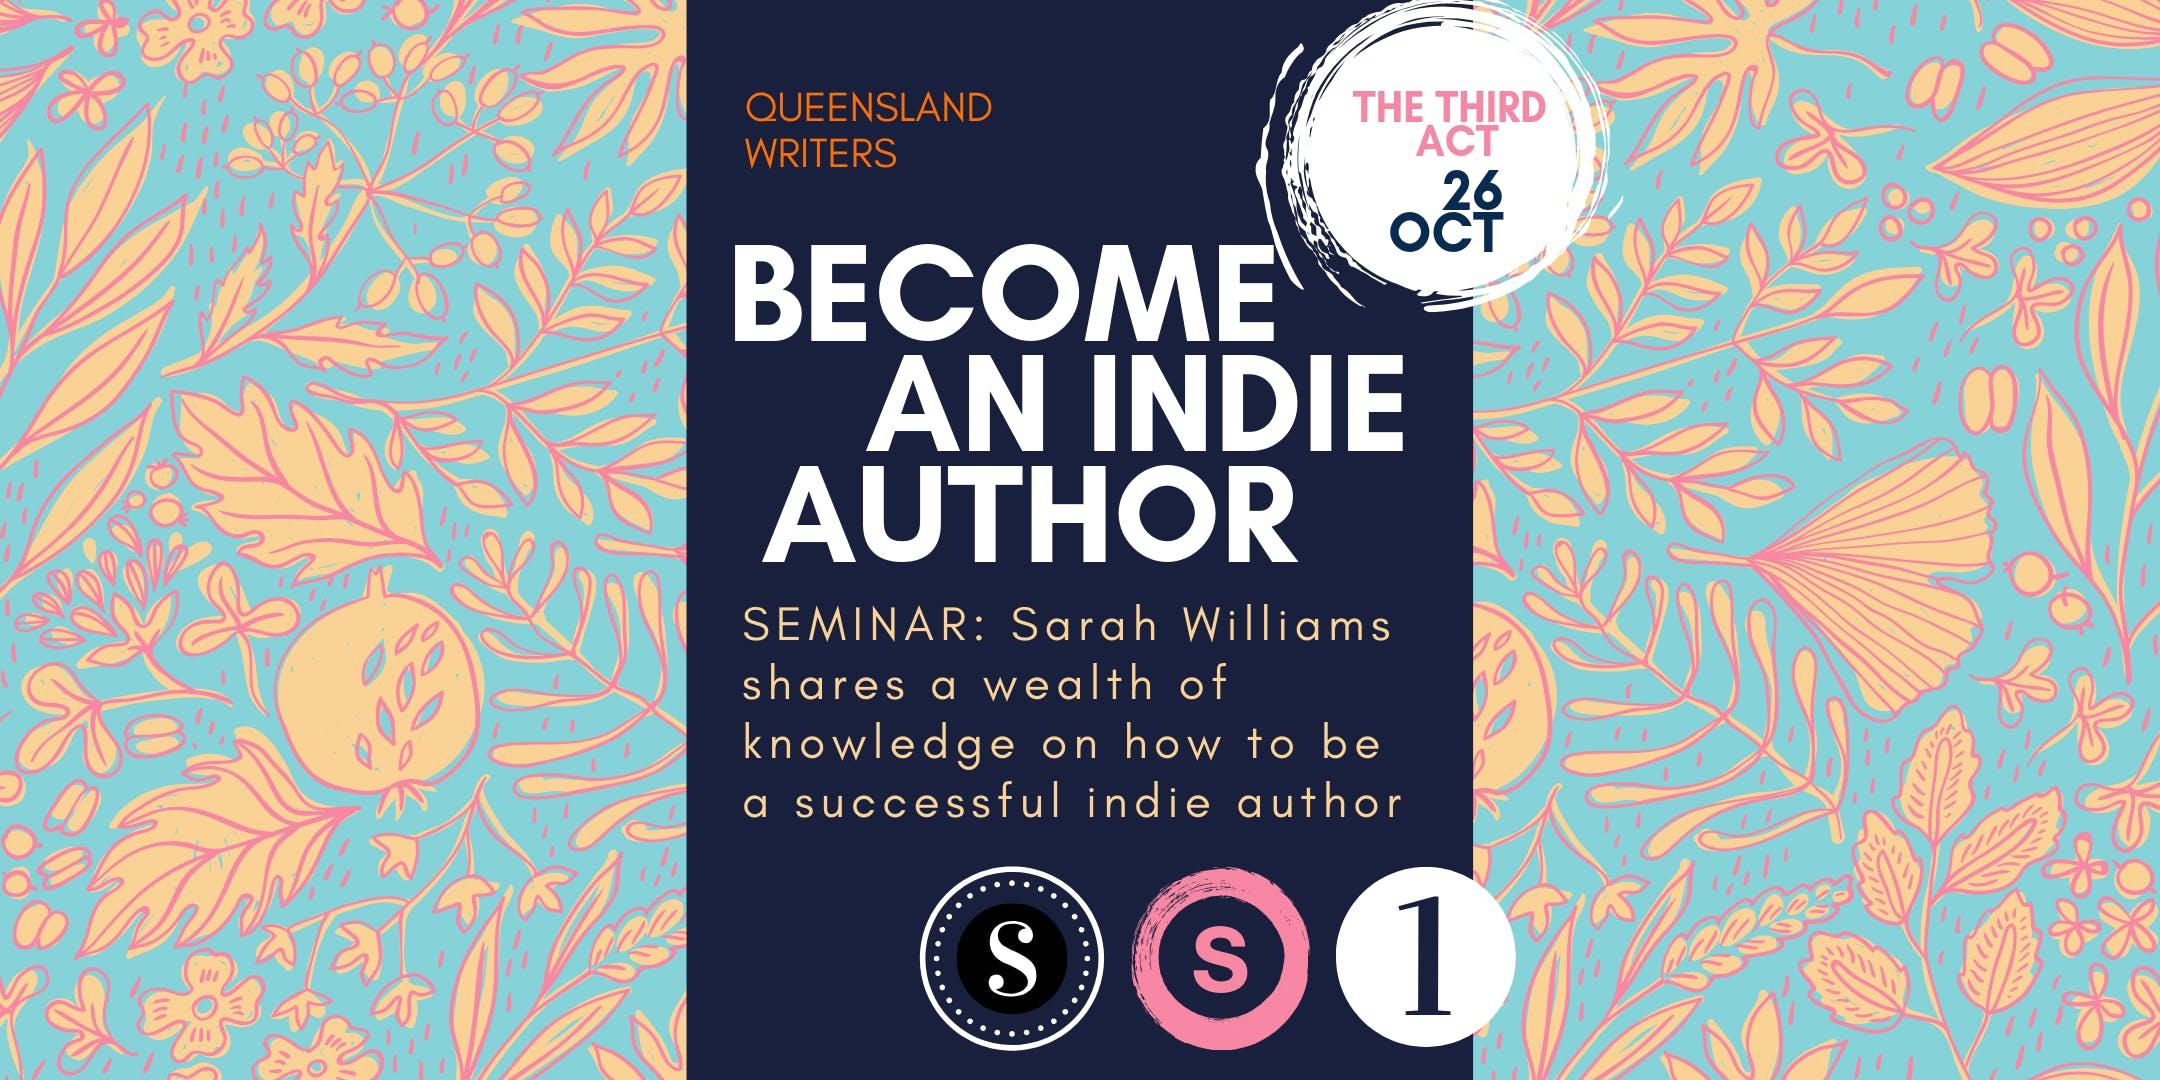 Becoming An Indie Author Success with Sarah Williams